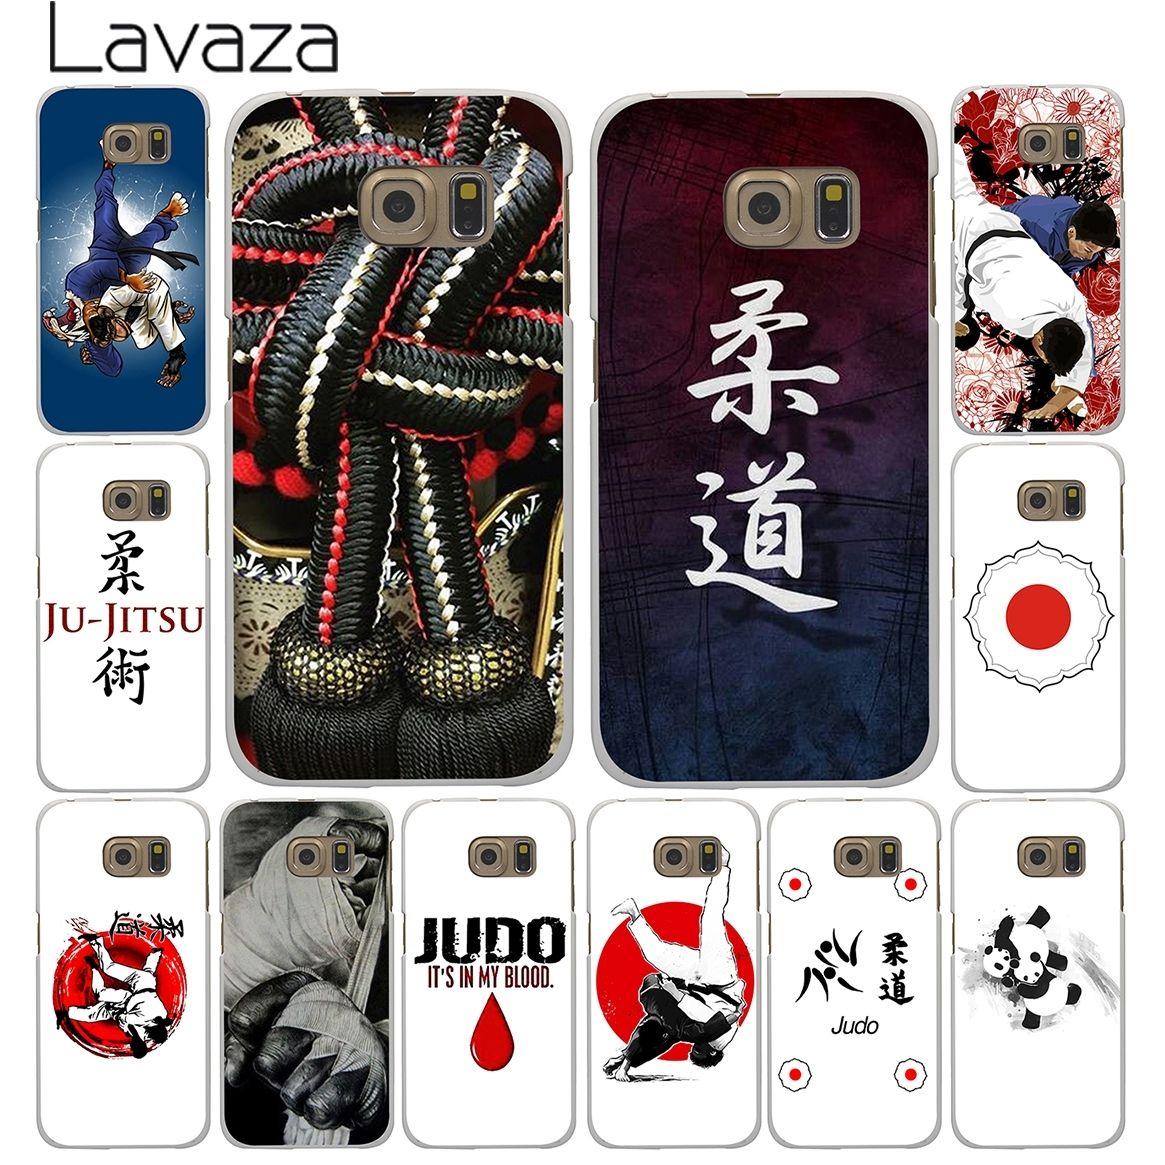 Lavaza Janpan Judo White Case for Samsung Galaxy A3 A5 A7 A8 J3 J5 J7 2015 2016 2017 & Grand Prime 2 Note 4 3 Cover